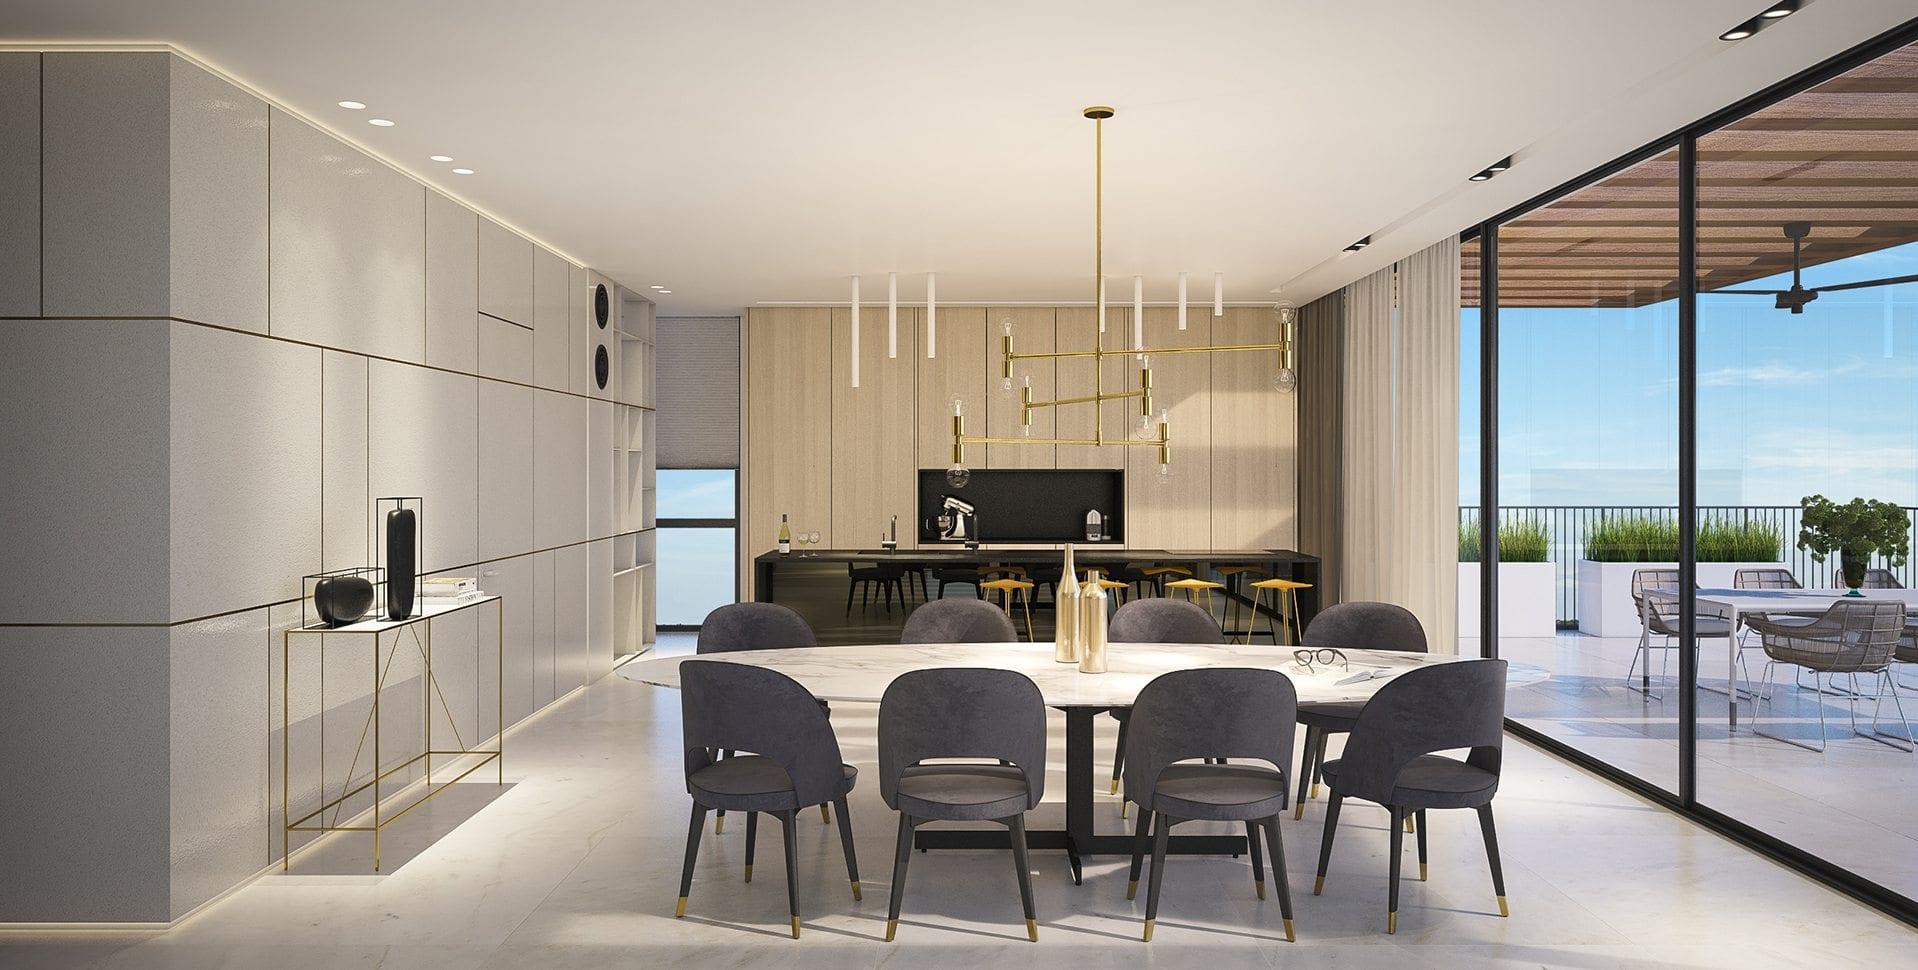 Maayan-Golan_Architectural-Visualization_ apartment-yehuda-halevi-tel-aviv_interior-visualization_kitchen-dining-room_design-ws-studio_03